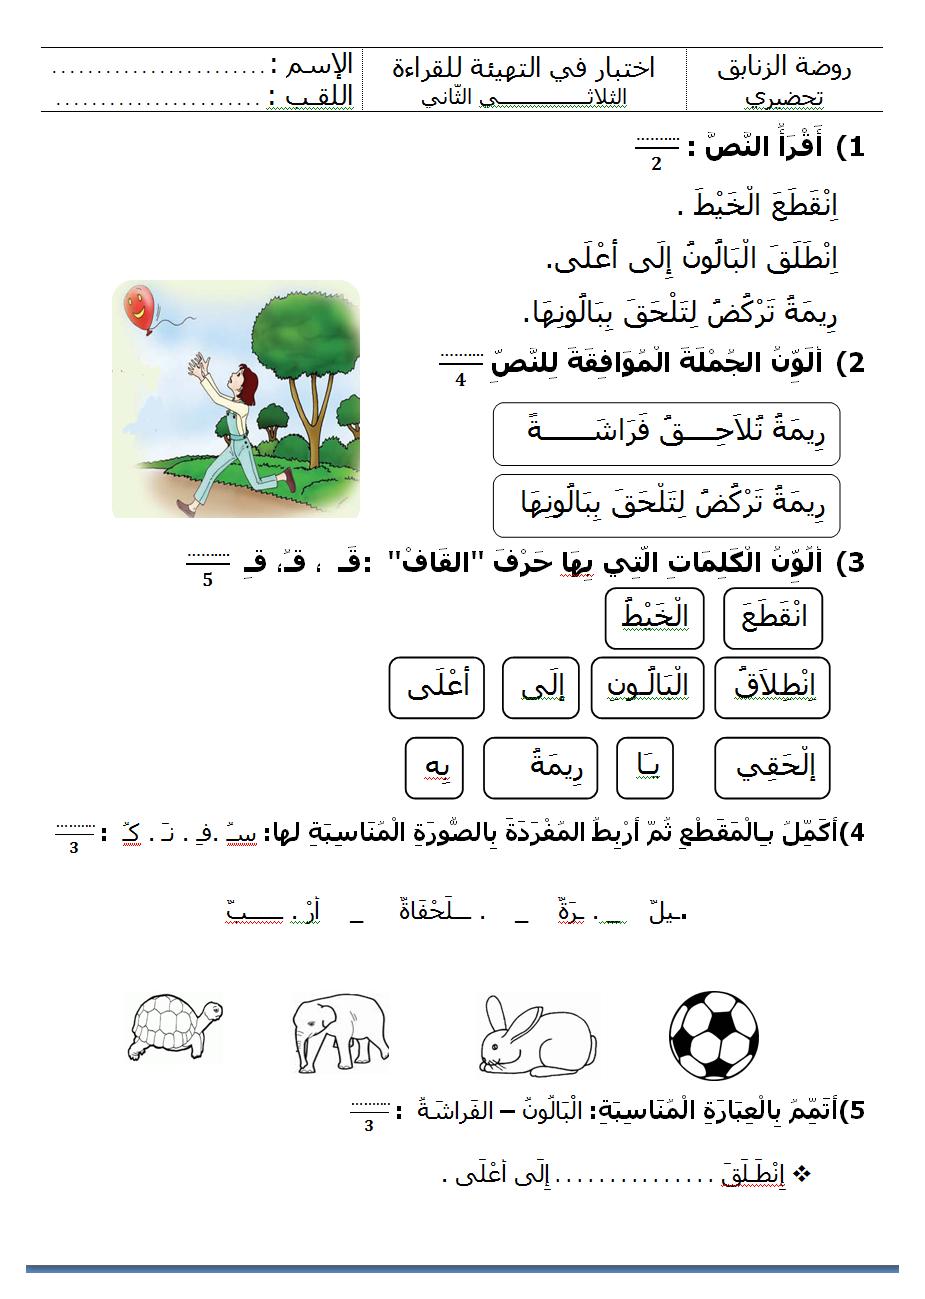 Ashampoo Snap 2016 01 10 22h09m47s 006 Document Microsoft Word Png 925 1 299 Pixels Learning Arabic Learn Arabic Language Arabic Kids